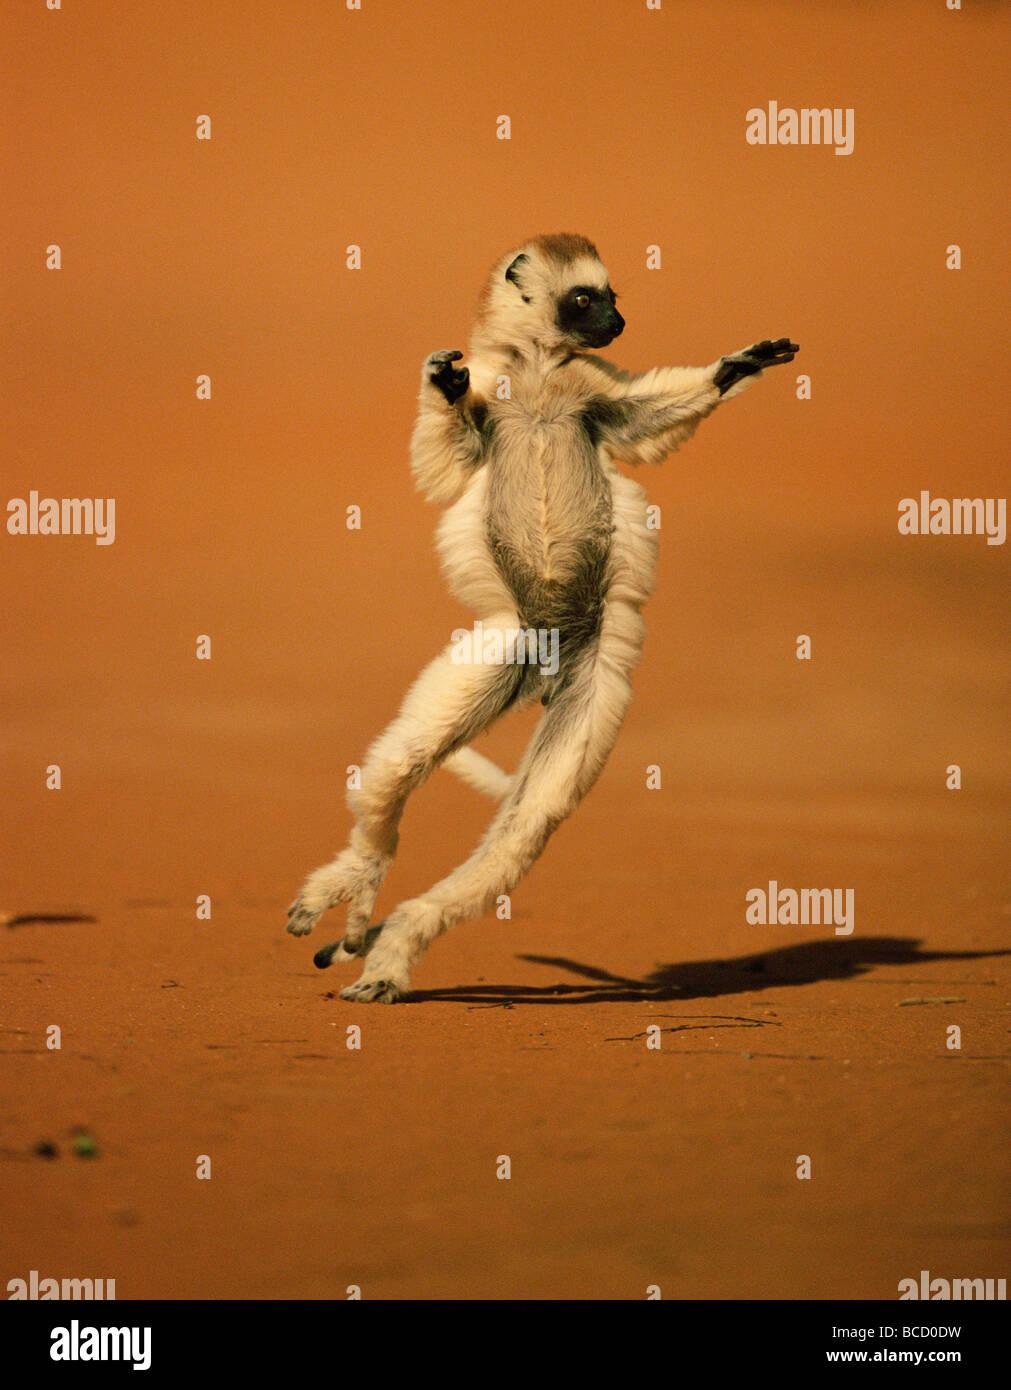 La VERREAUX SIFAKA (Propithecus verreauxi) dancing. Madagascar Immagini Stock